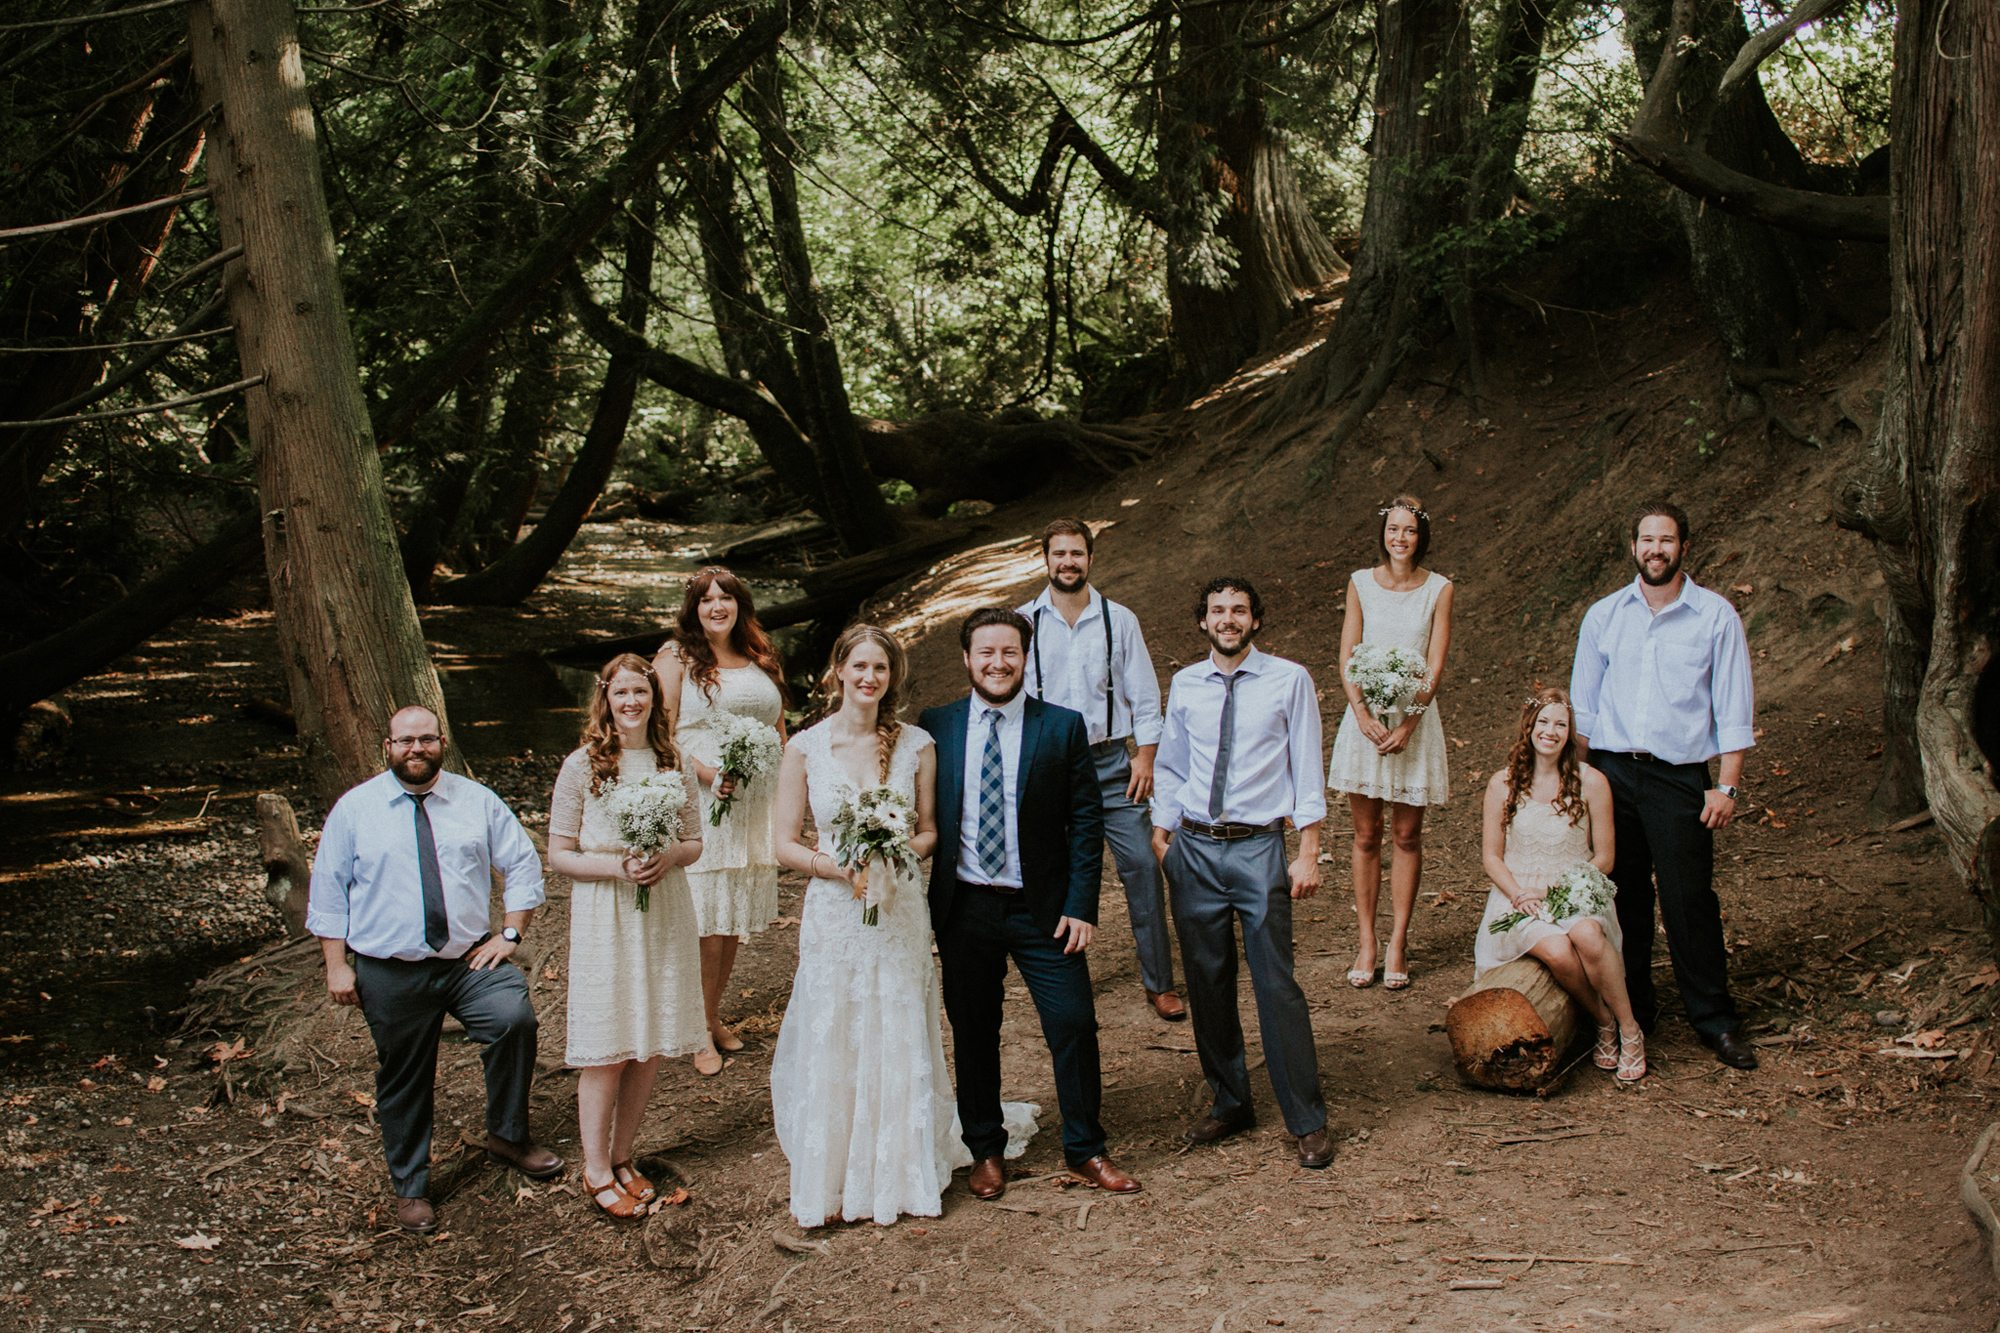 852-abbotsford-wedding-photographer